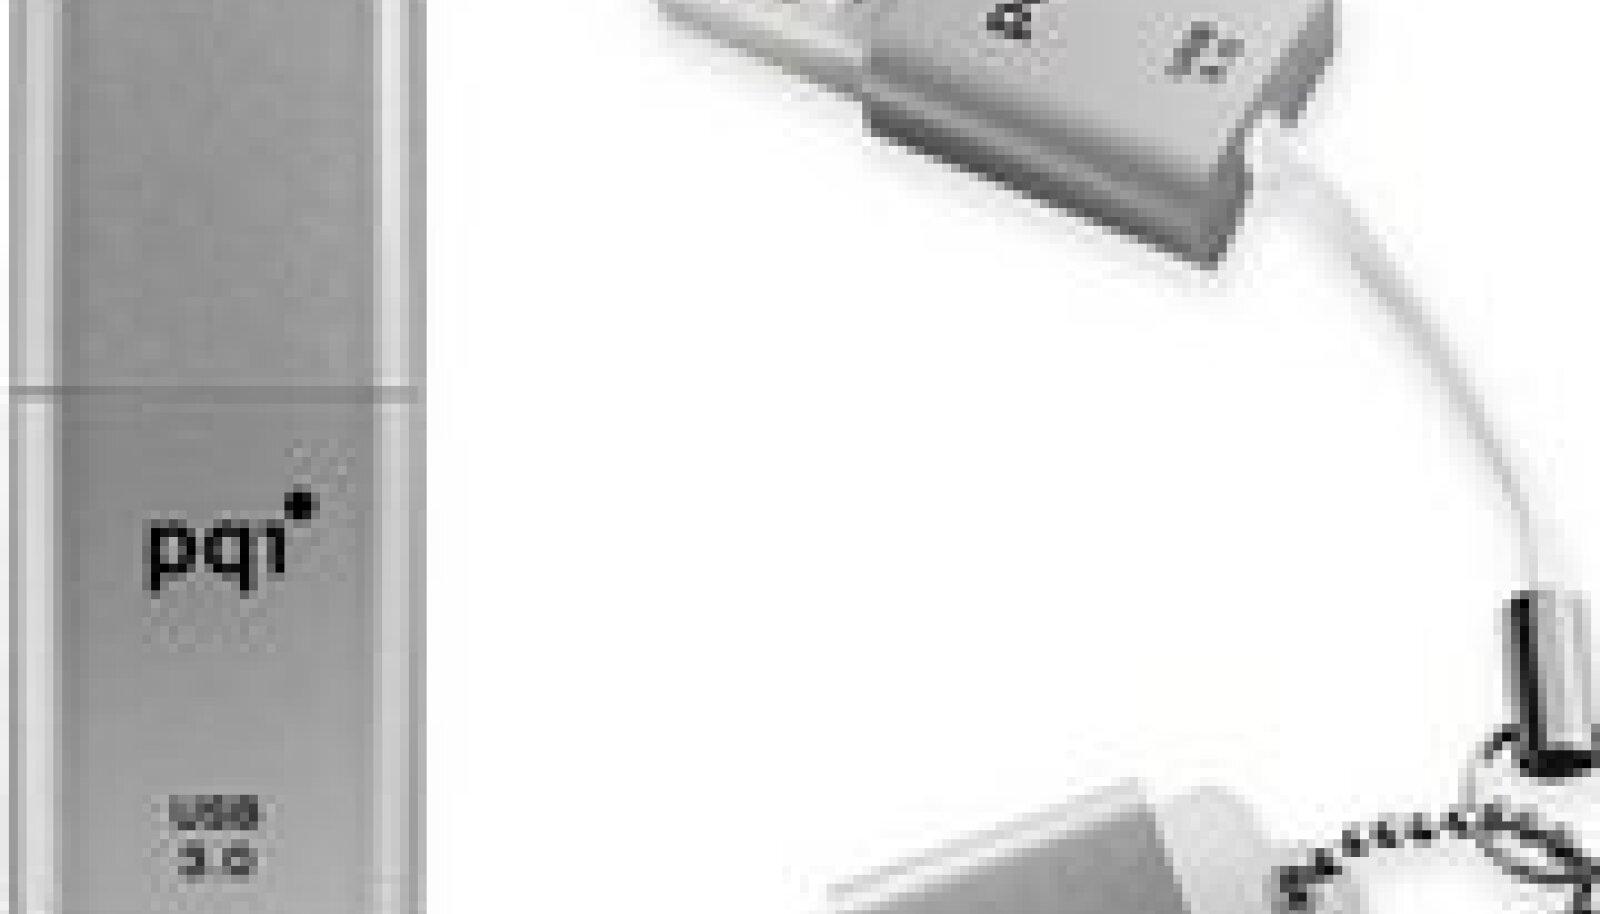 Pisim USB 3.0 mälupulk